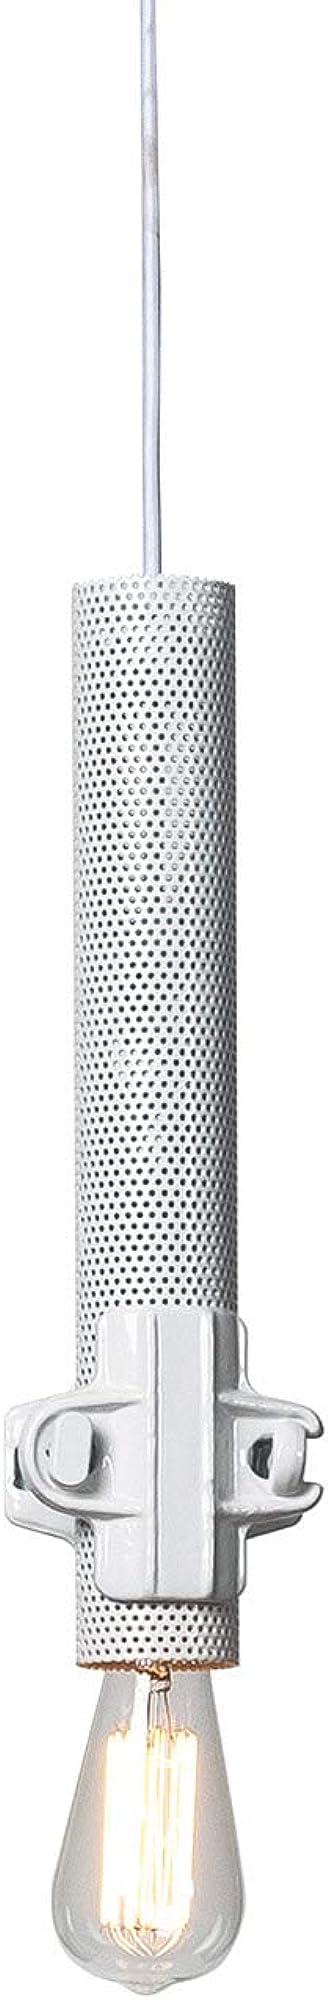 Karman nando, lampada a sospensione,rosone in metallo SE1091B INT